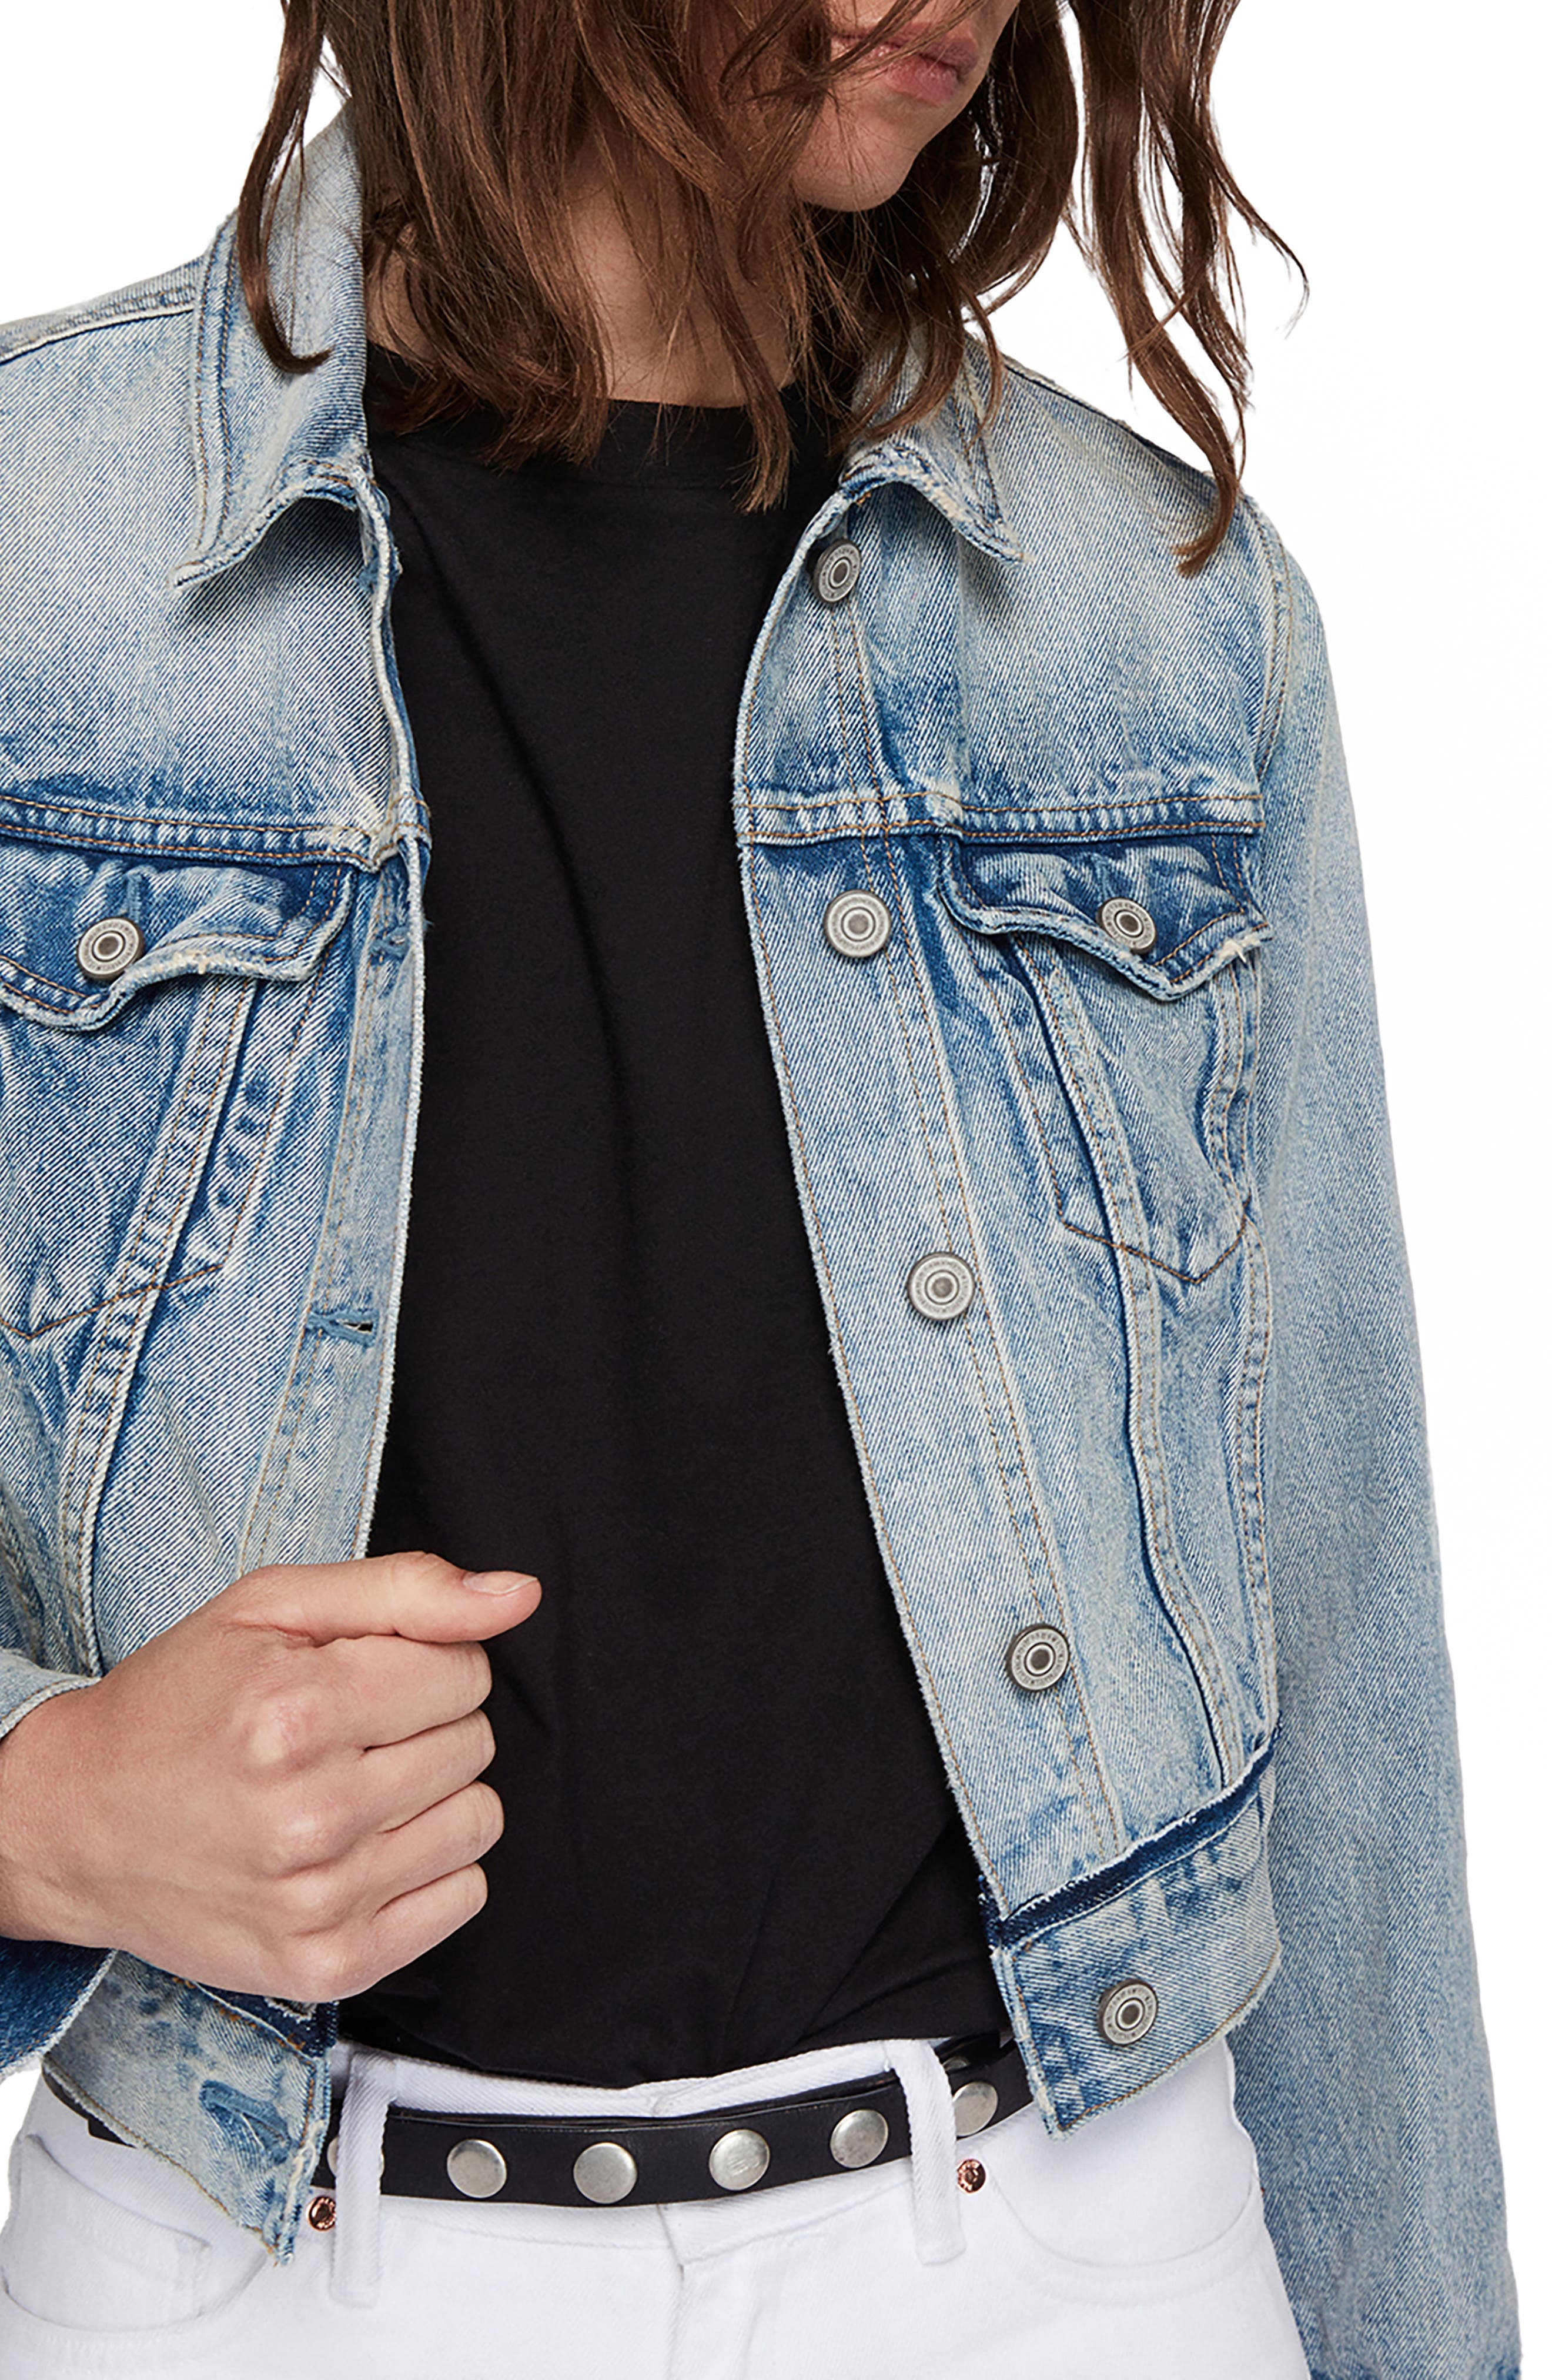 ALLSAINTS Hay Cropped Denim Jacket in Indigo Blue